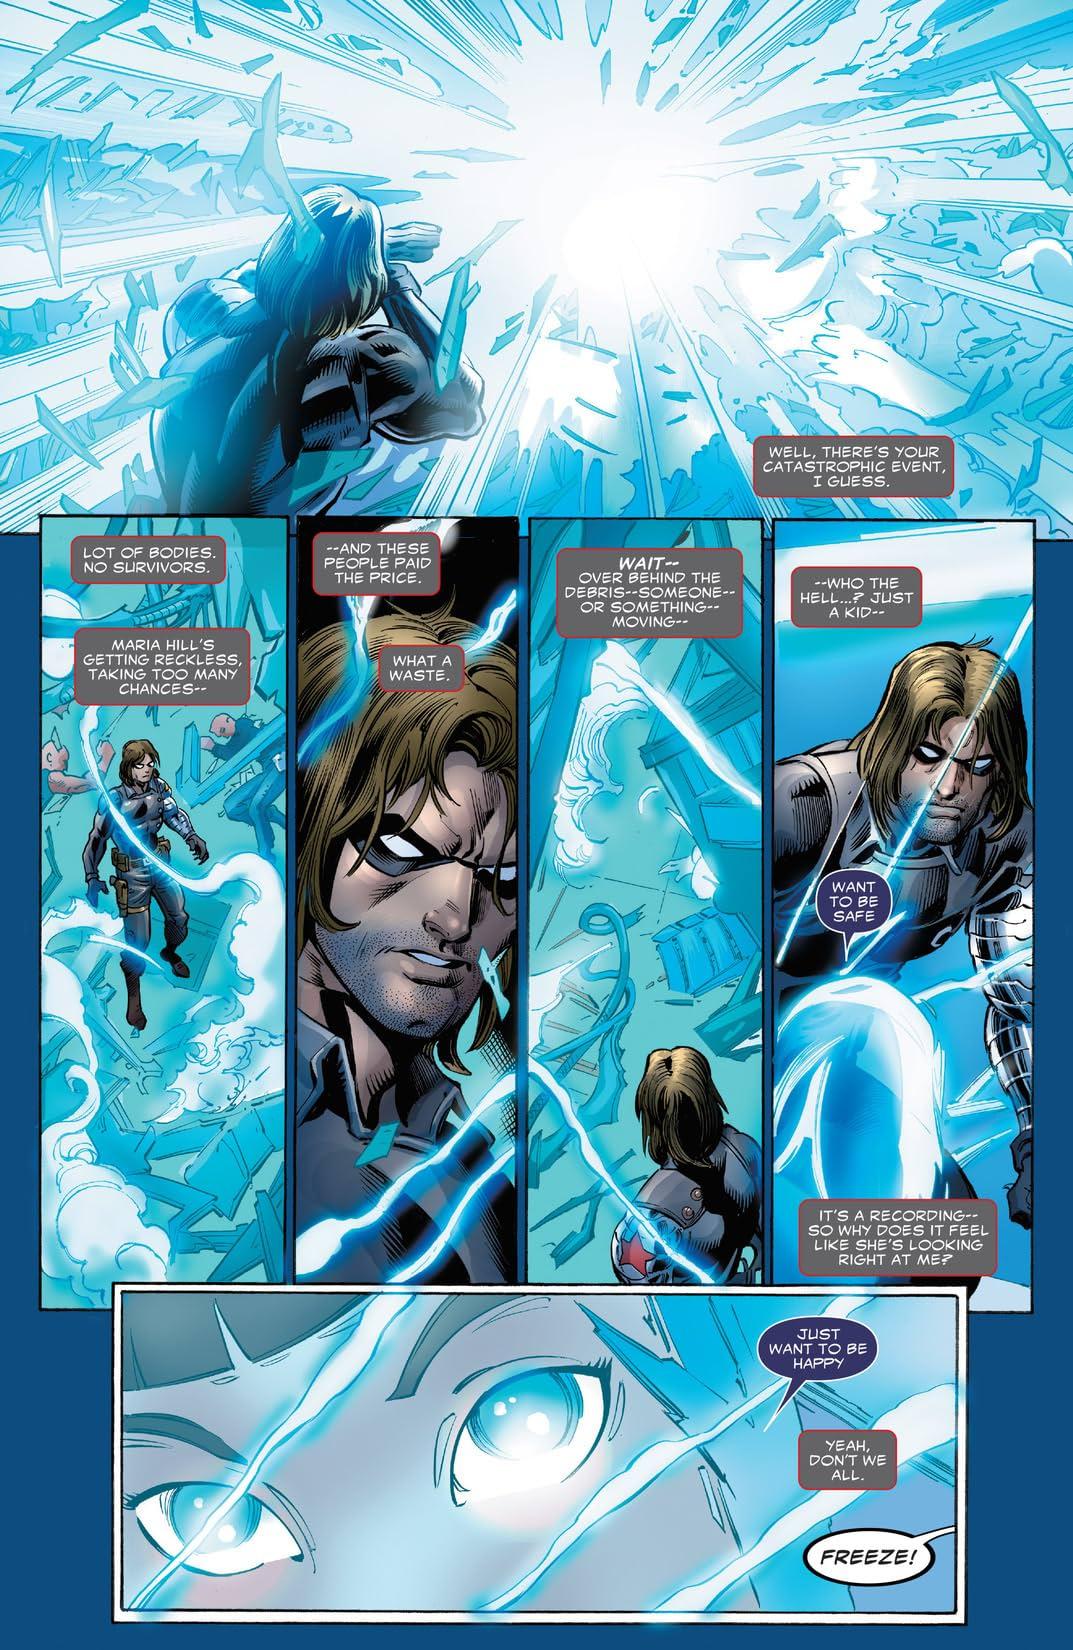 Avengers: Standoff